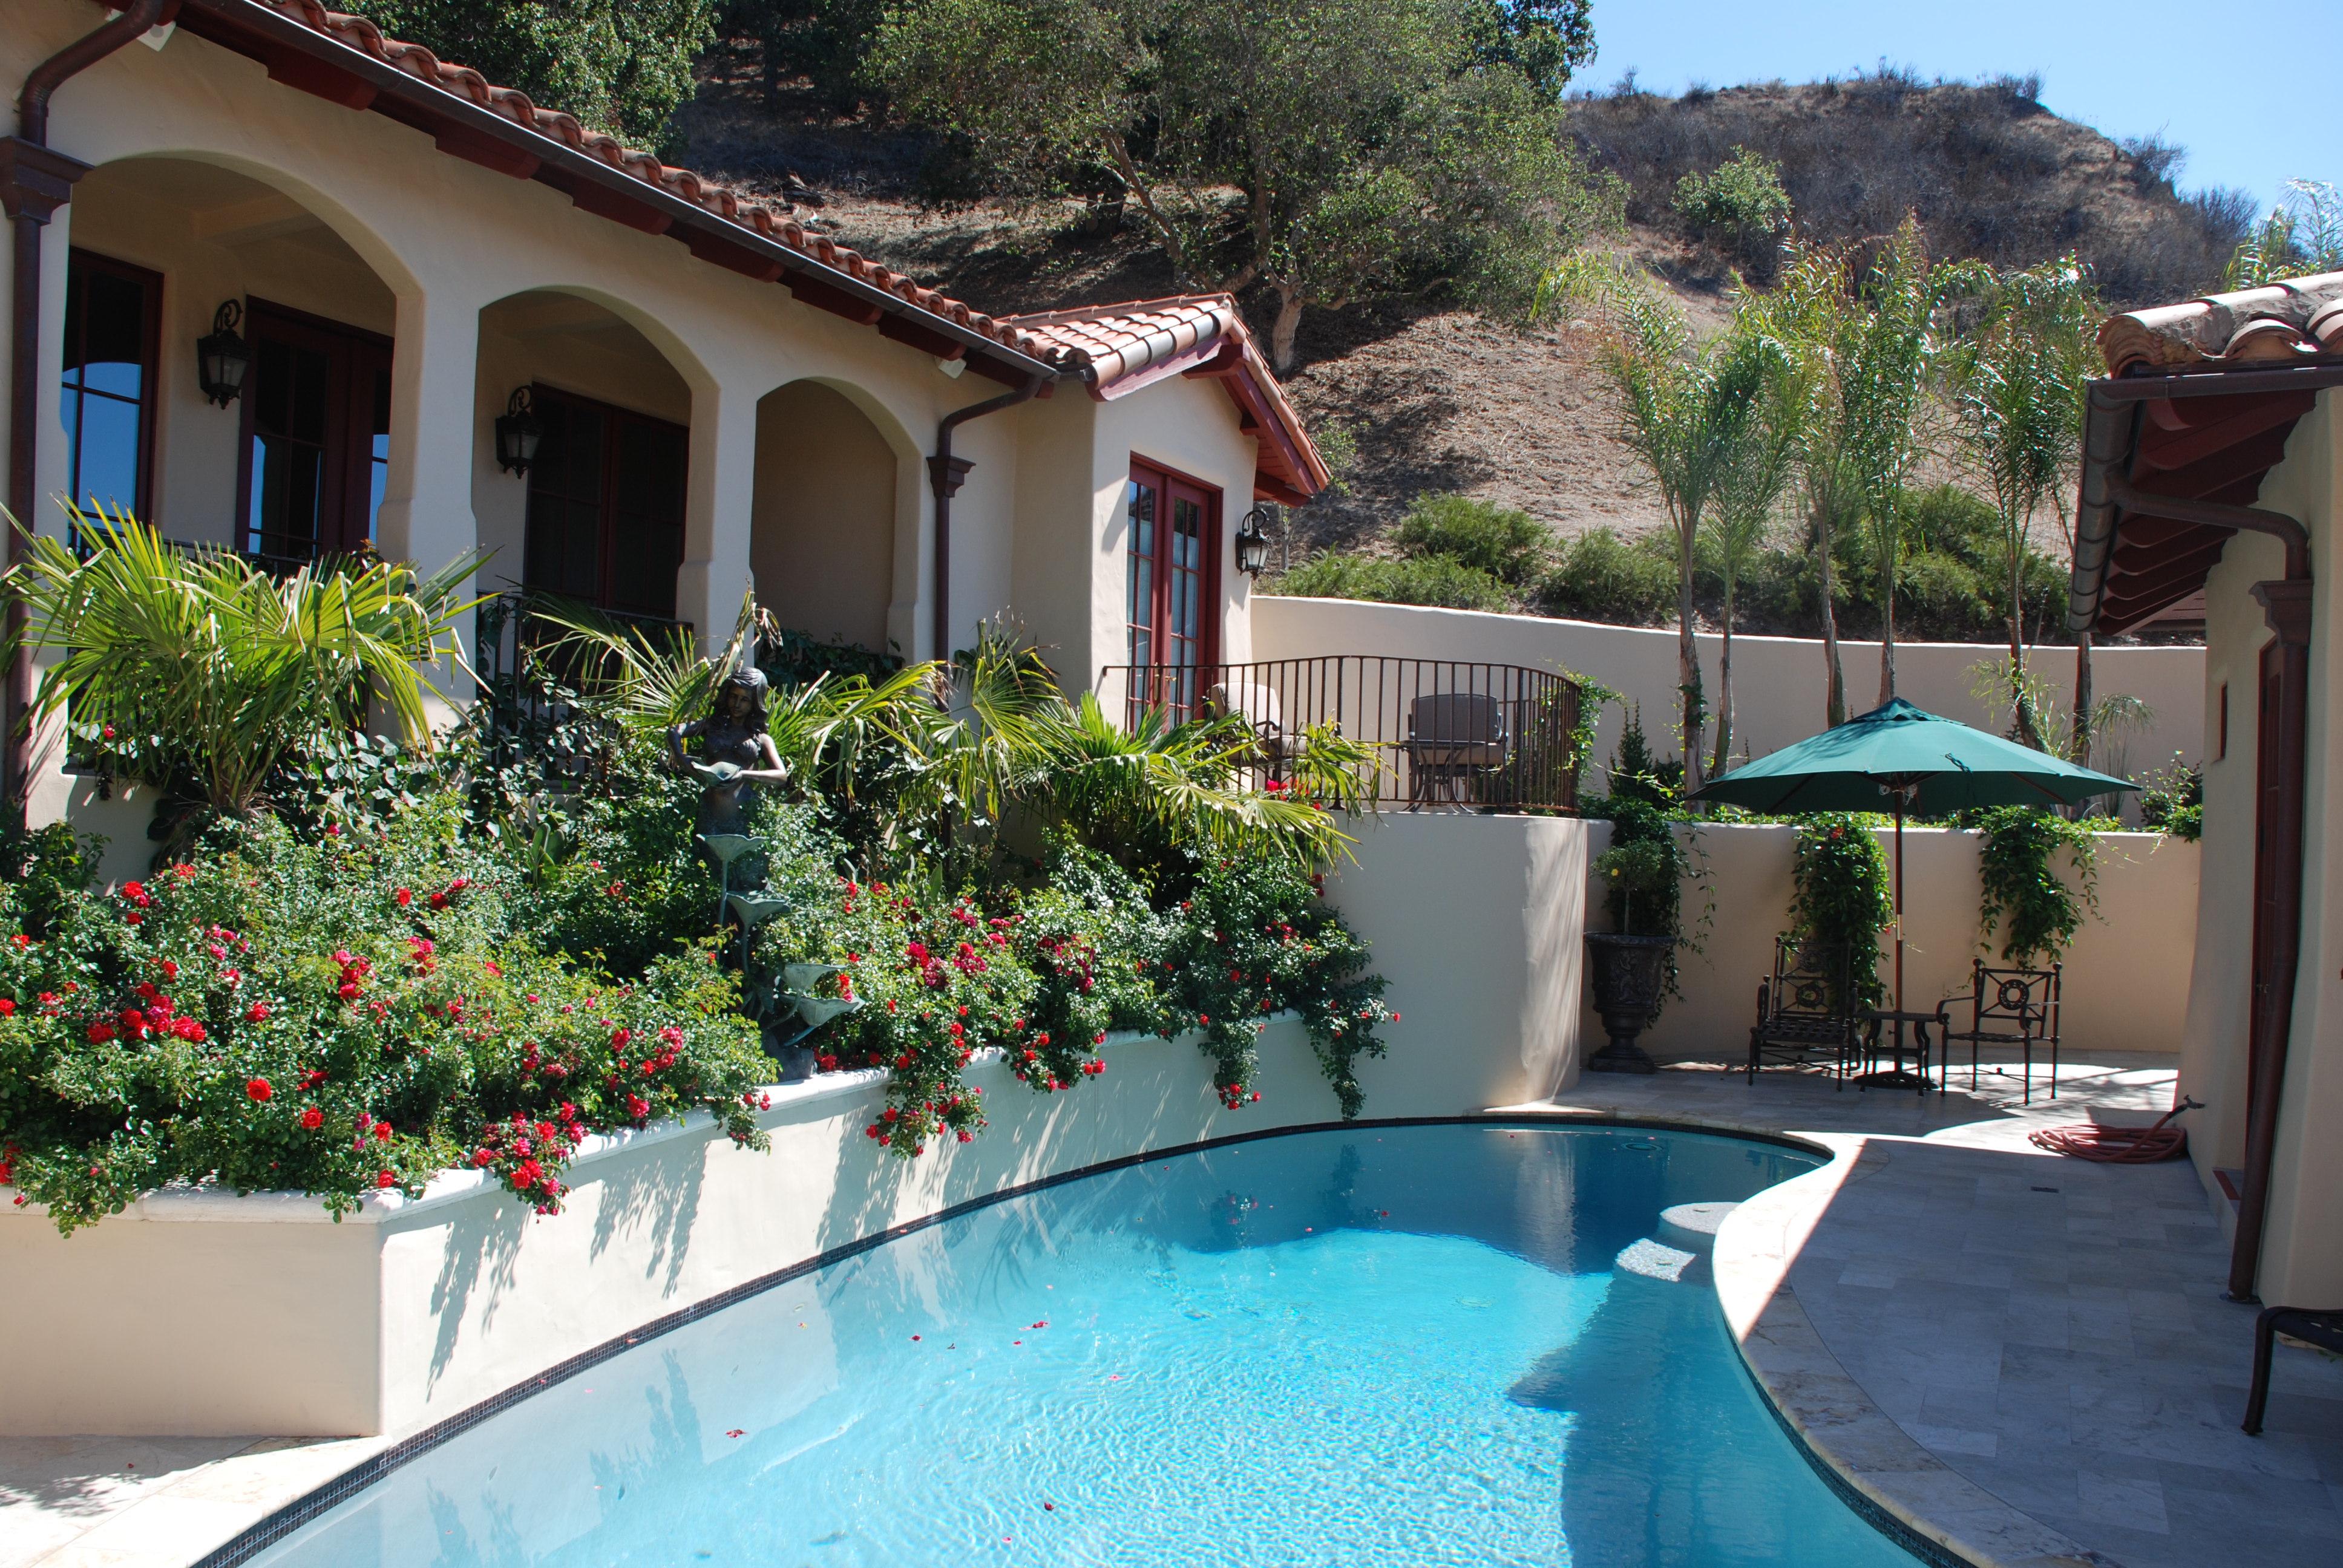 Hillside swimming pool retreat michael glassman associates for Hillside pool ideas